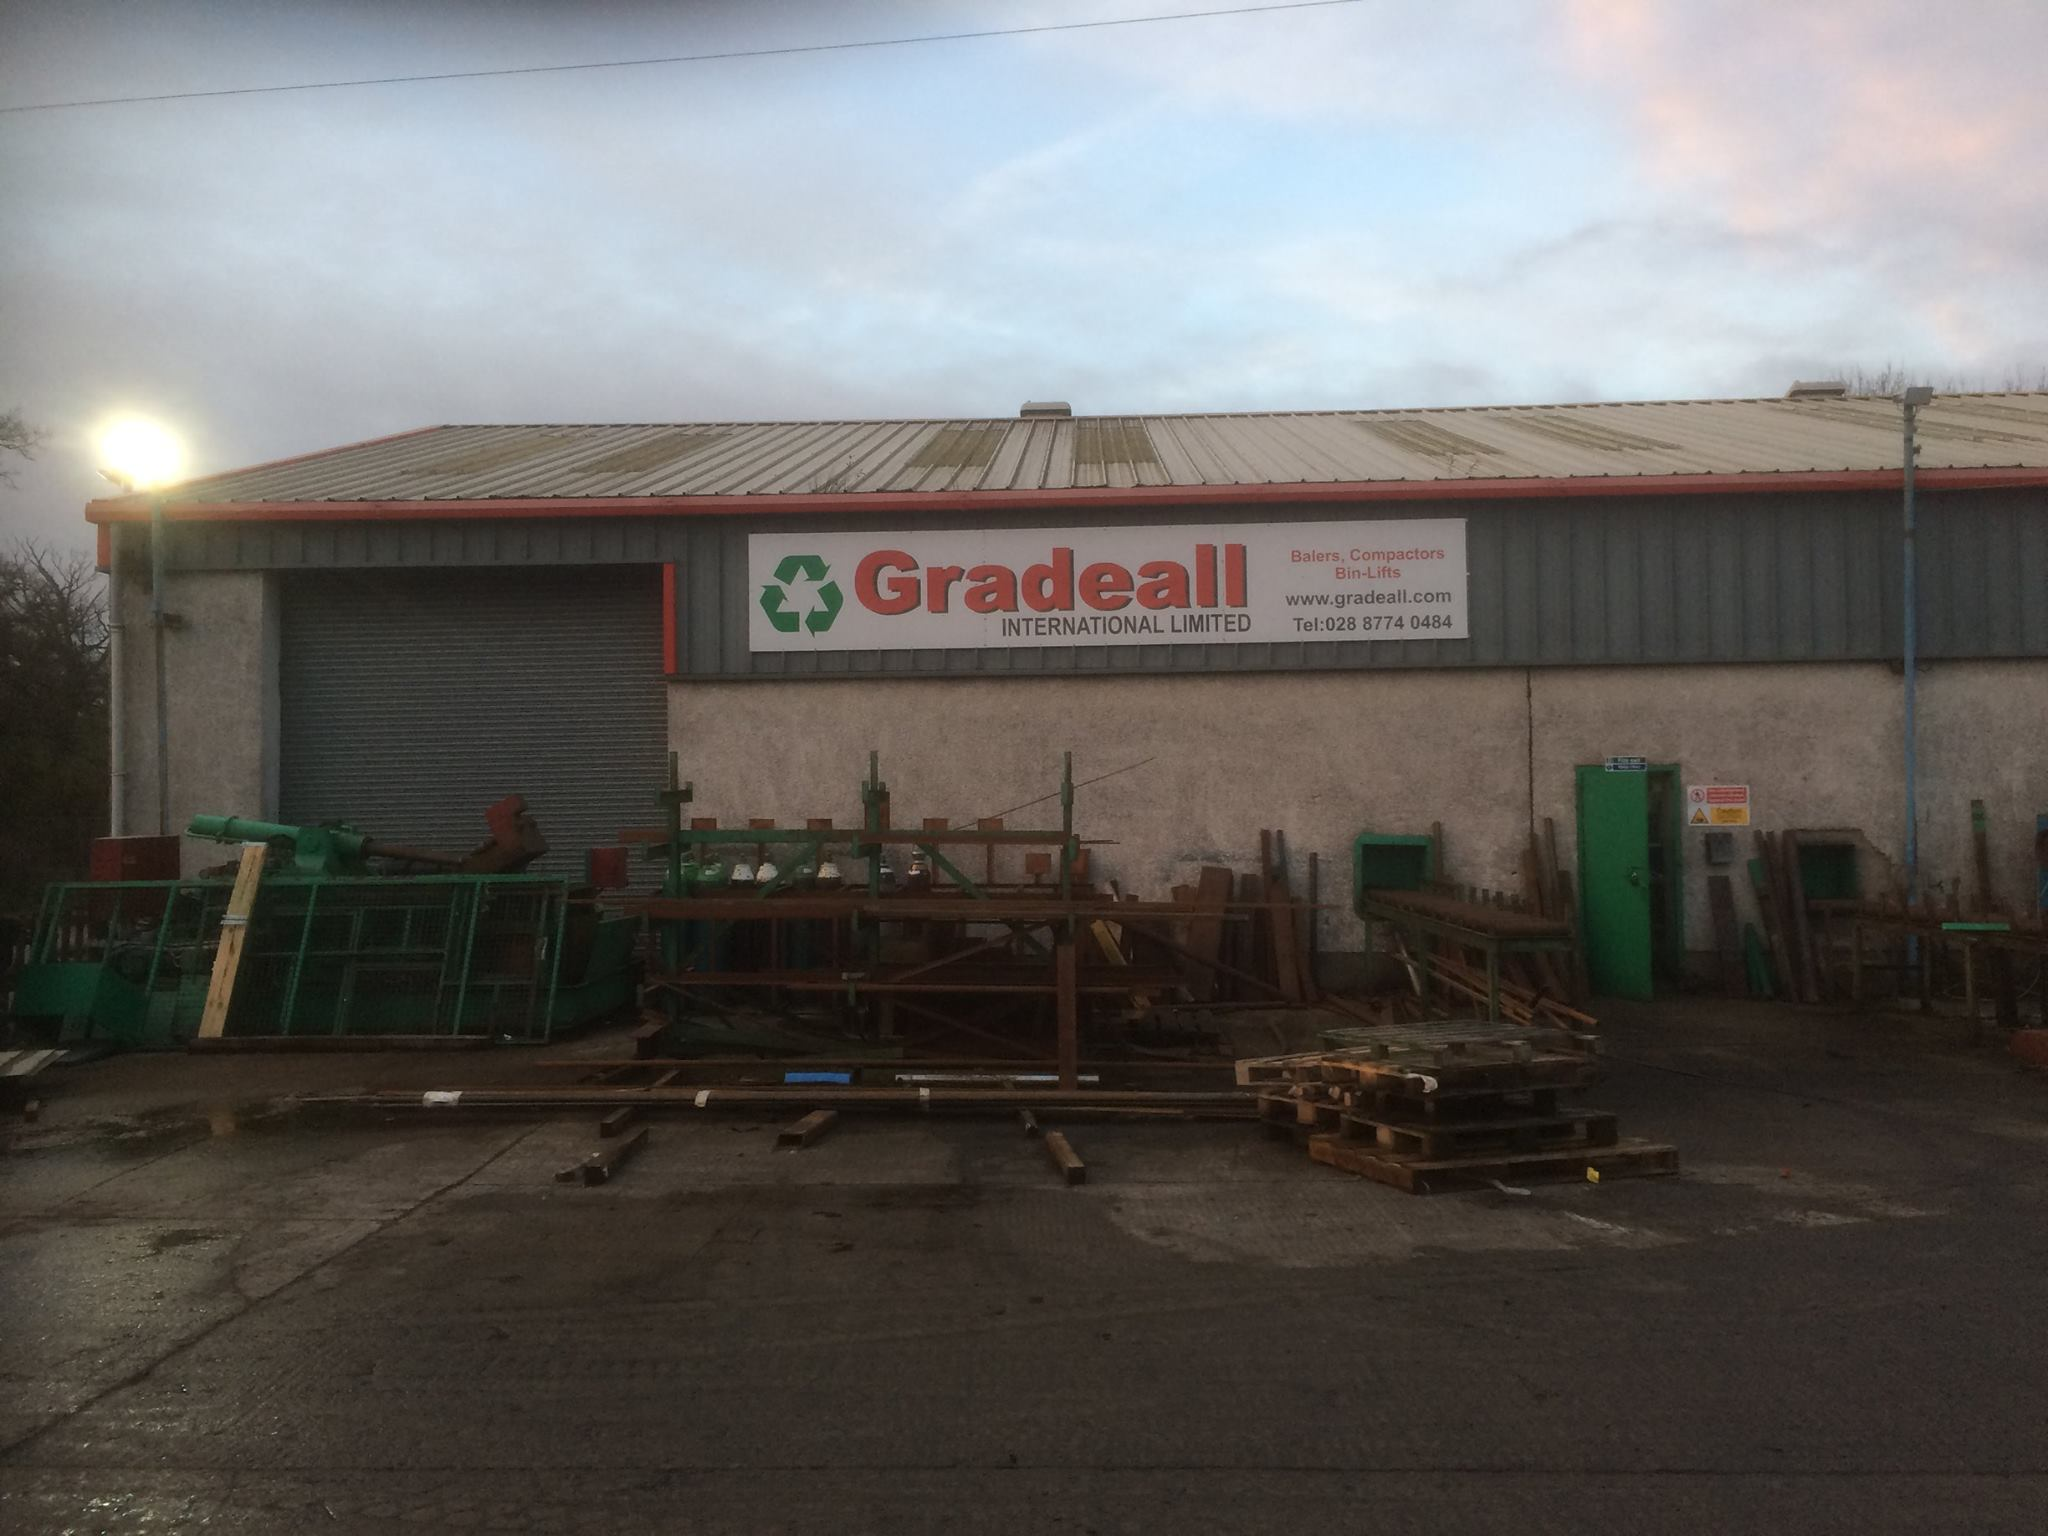 Gradeall International